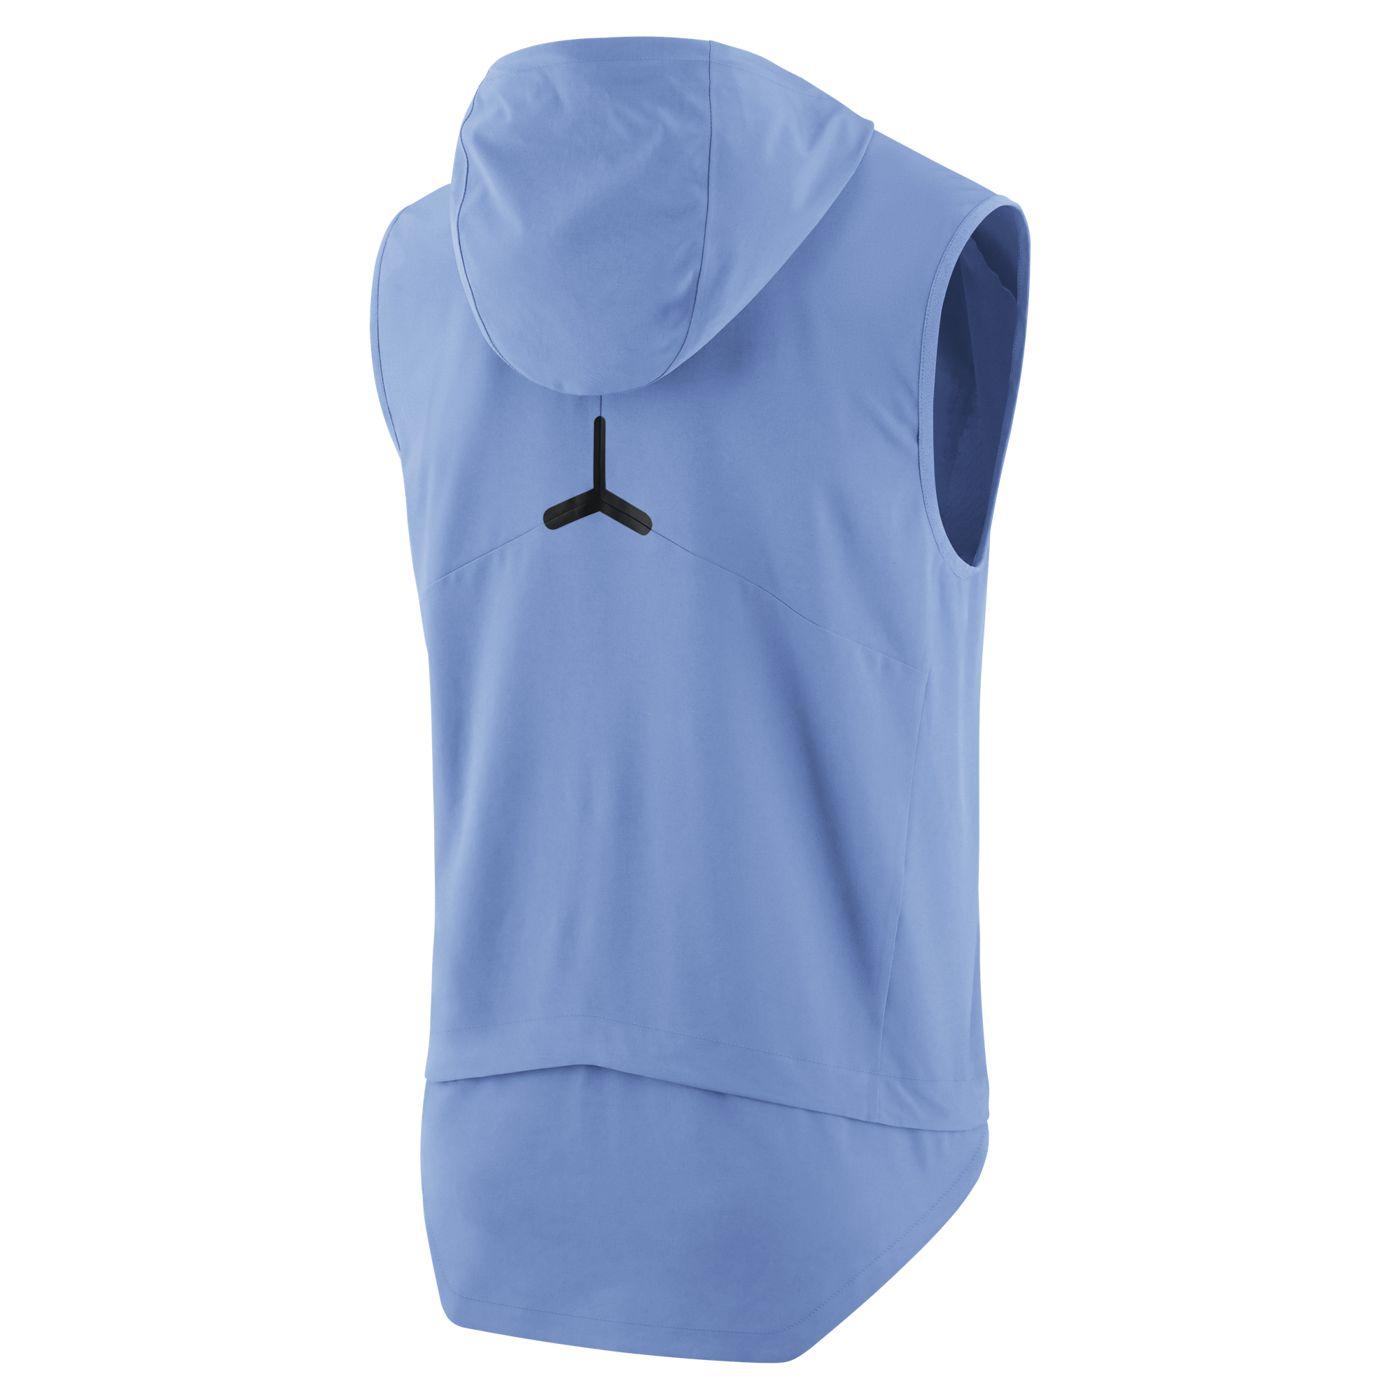 a4e46747b2cb Johnny T-shirt - North Carolina Tar Heels - Nike Flex Alpha Fly Rush Vest  (CB) by Nike